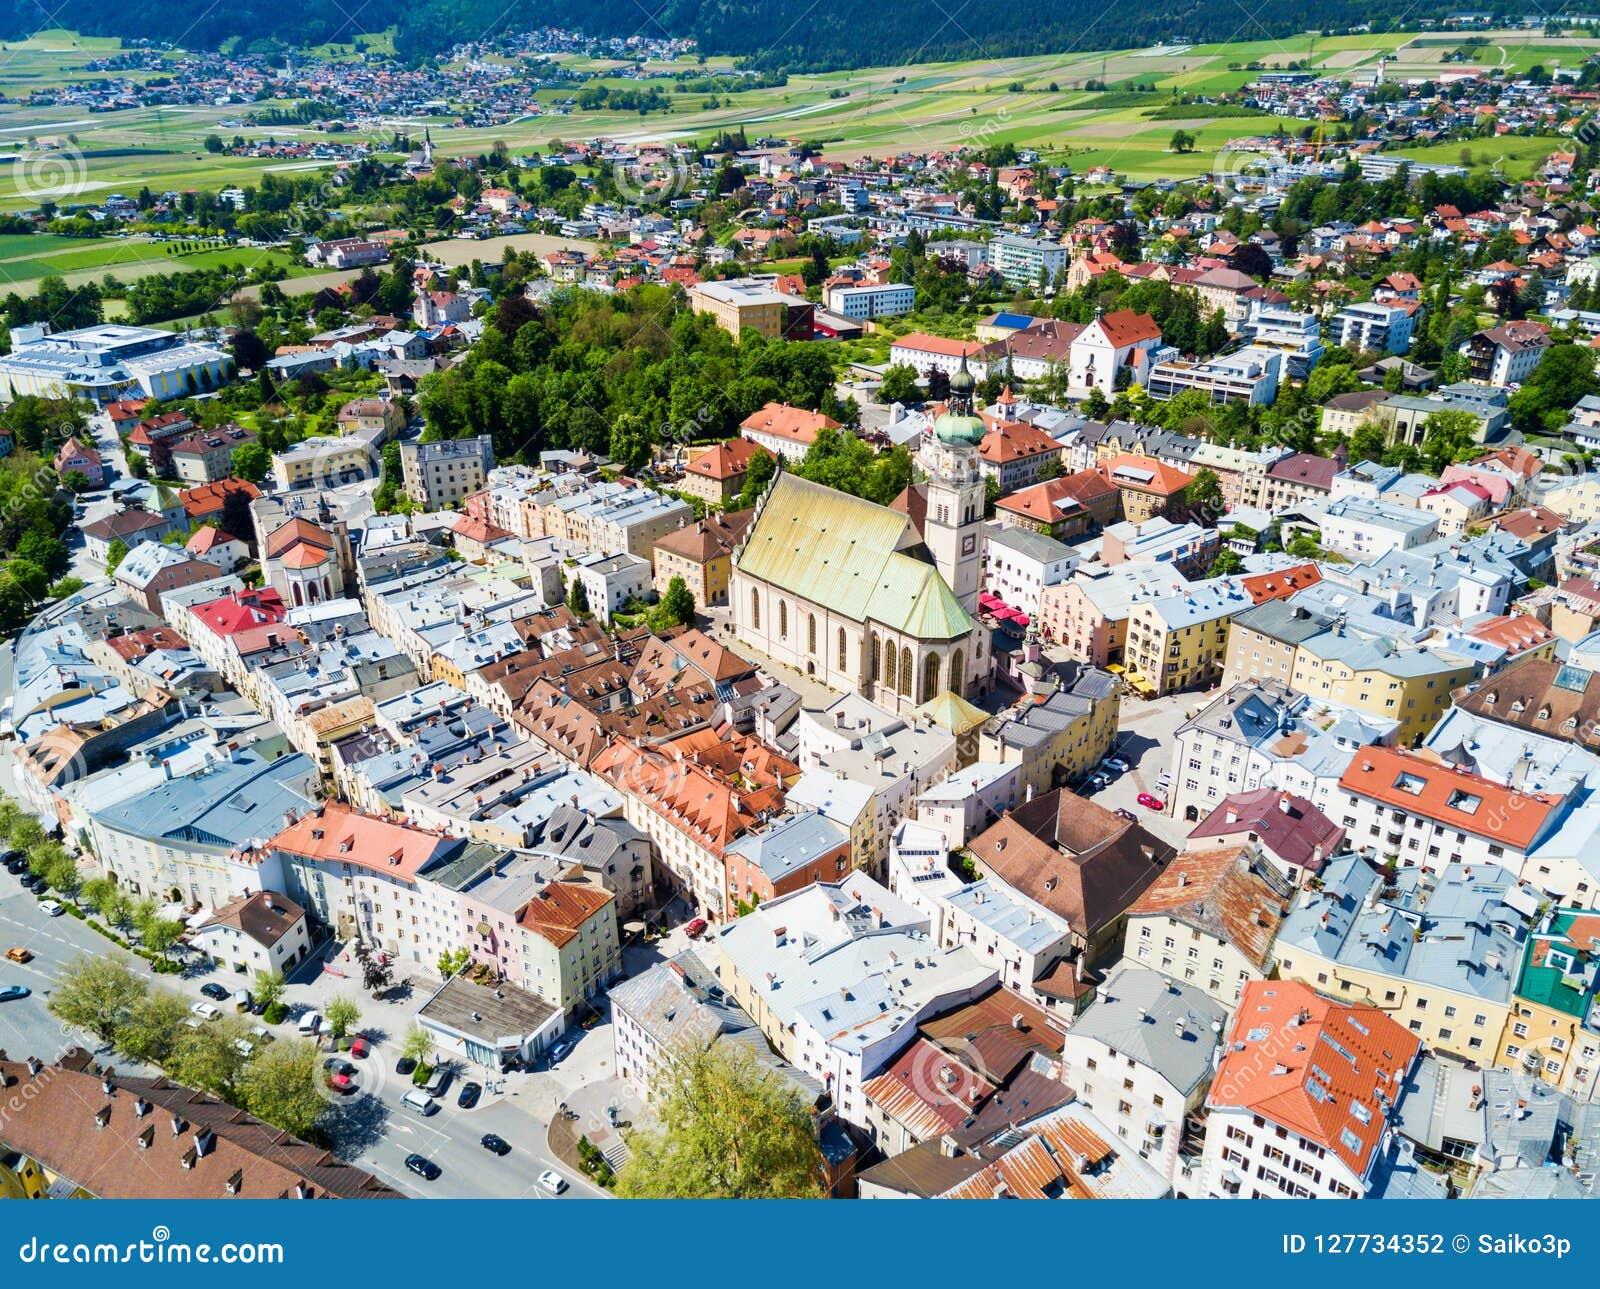 Hall Tirol widok z lotu ptaka